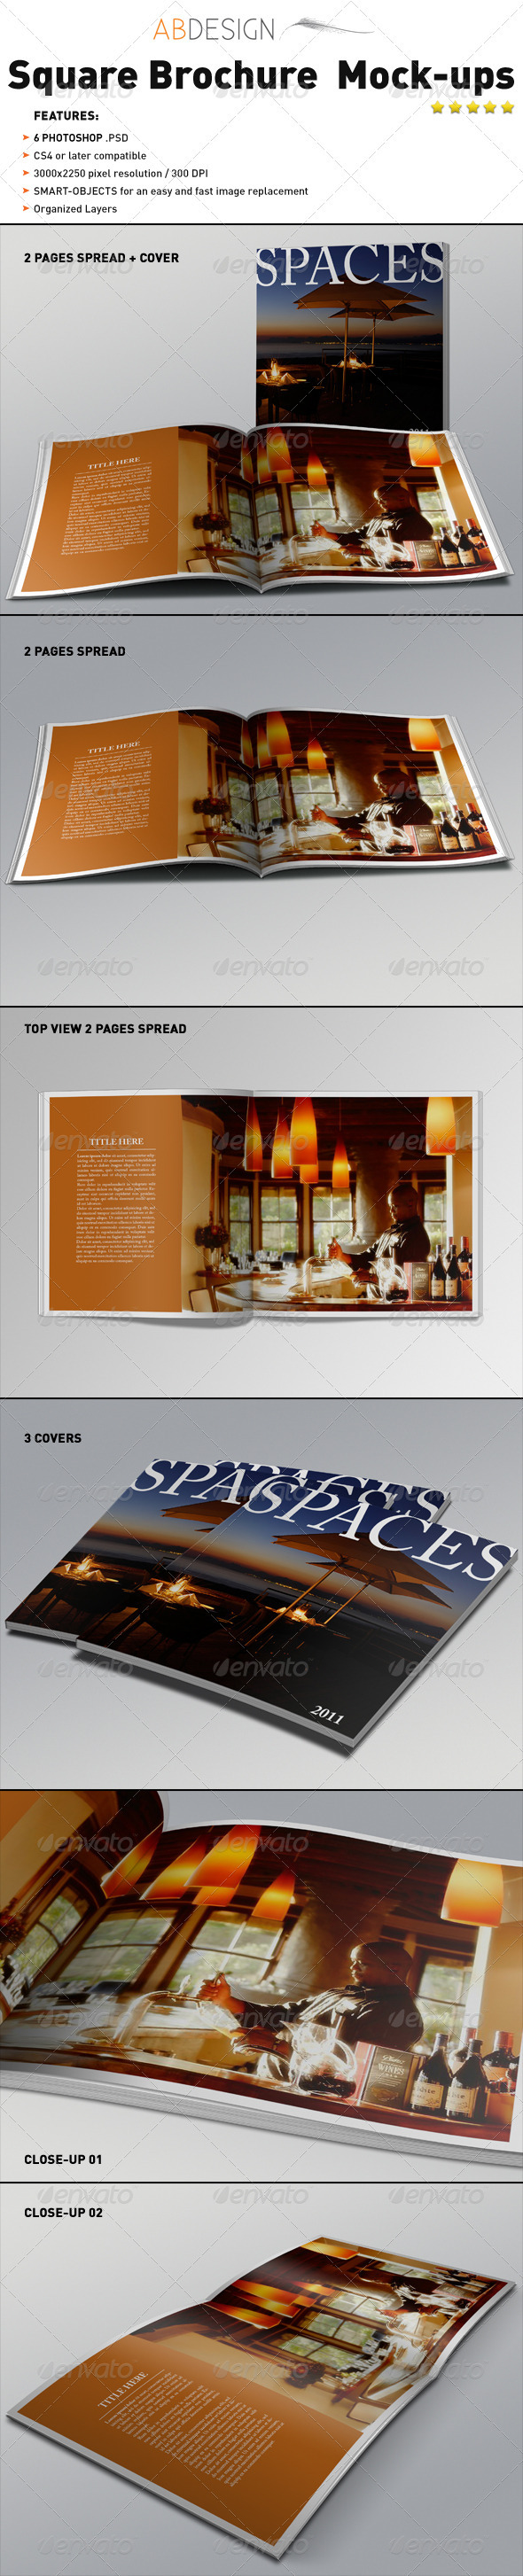 GraphicRiver Realistic Square Brochure Mock-ups Templates 1744235